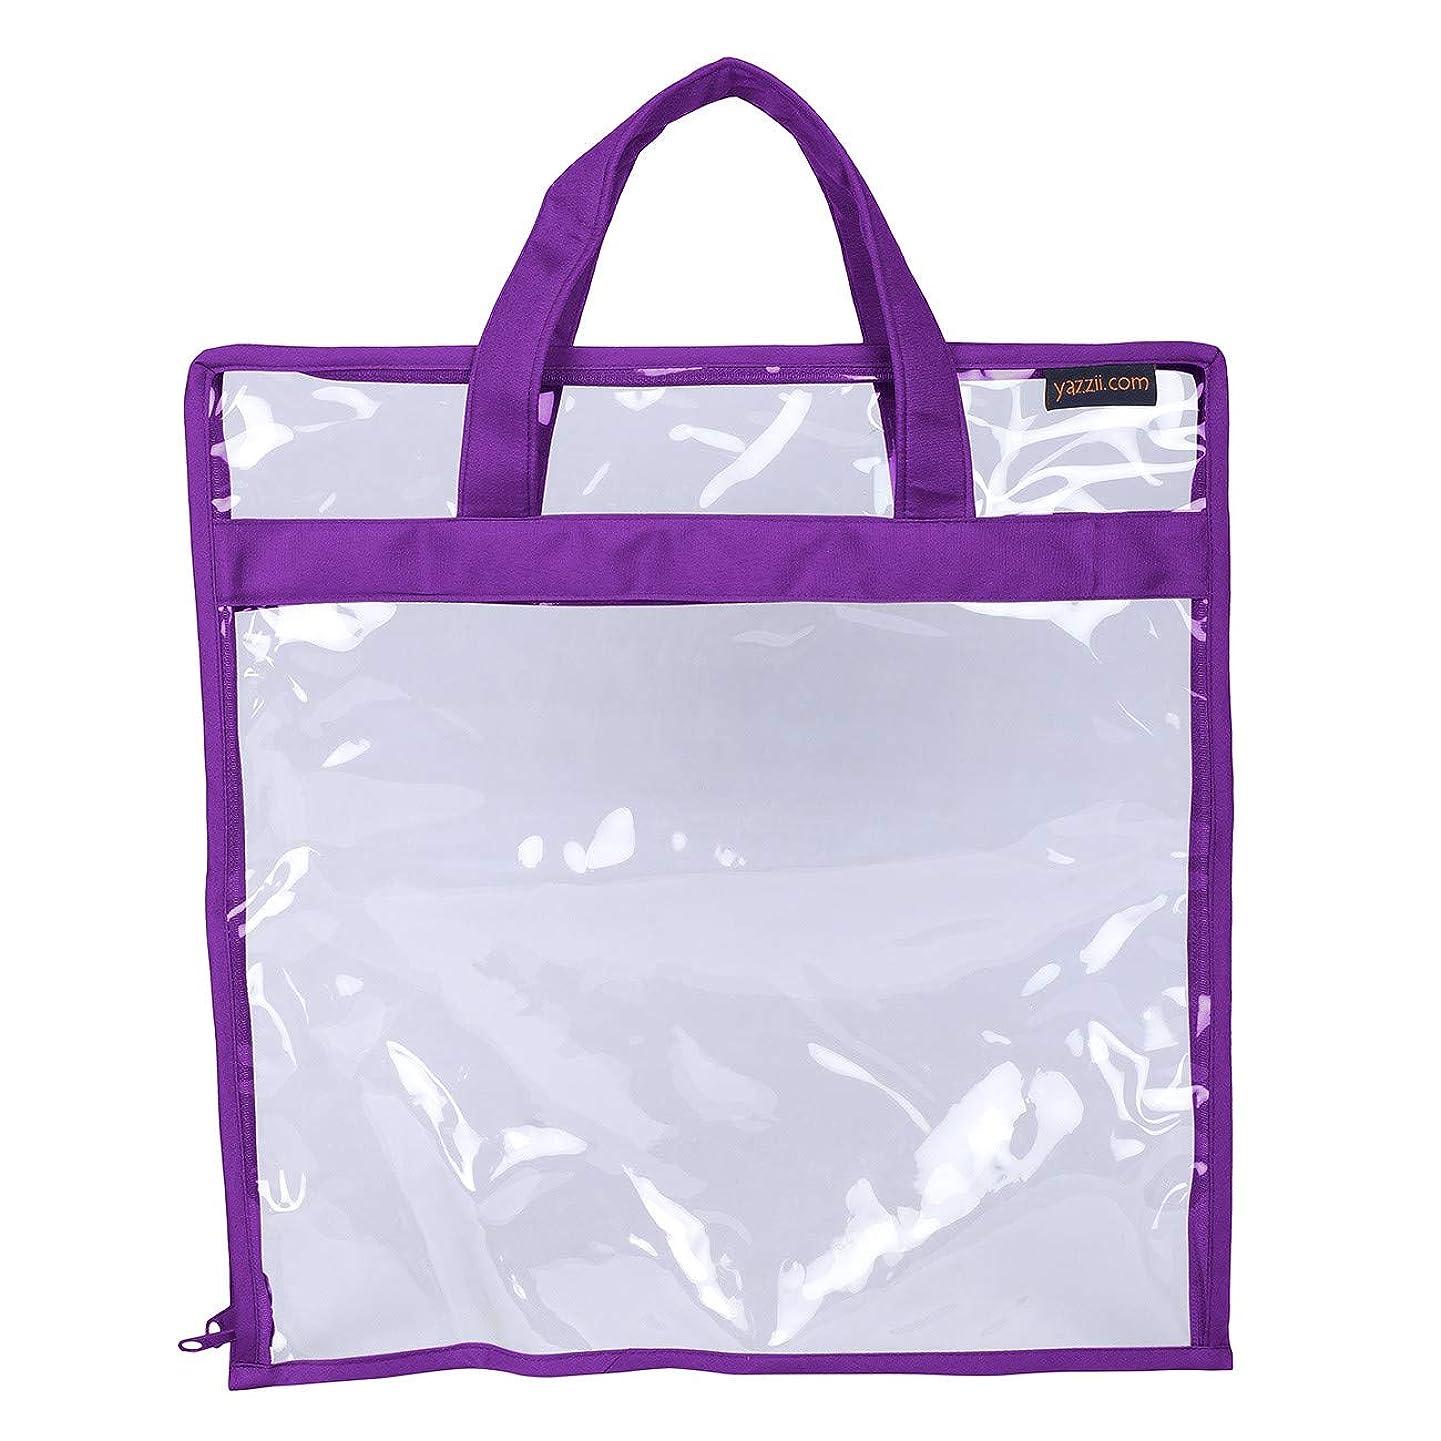 Yazzii Quilt Block Carry Case, Purple